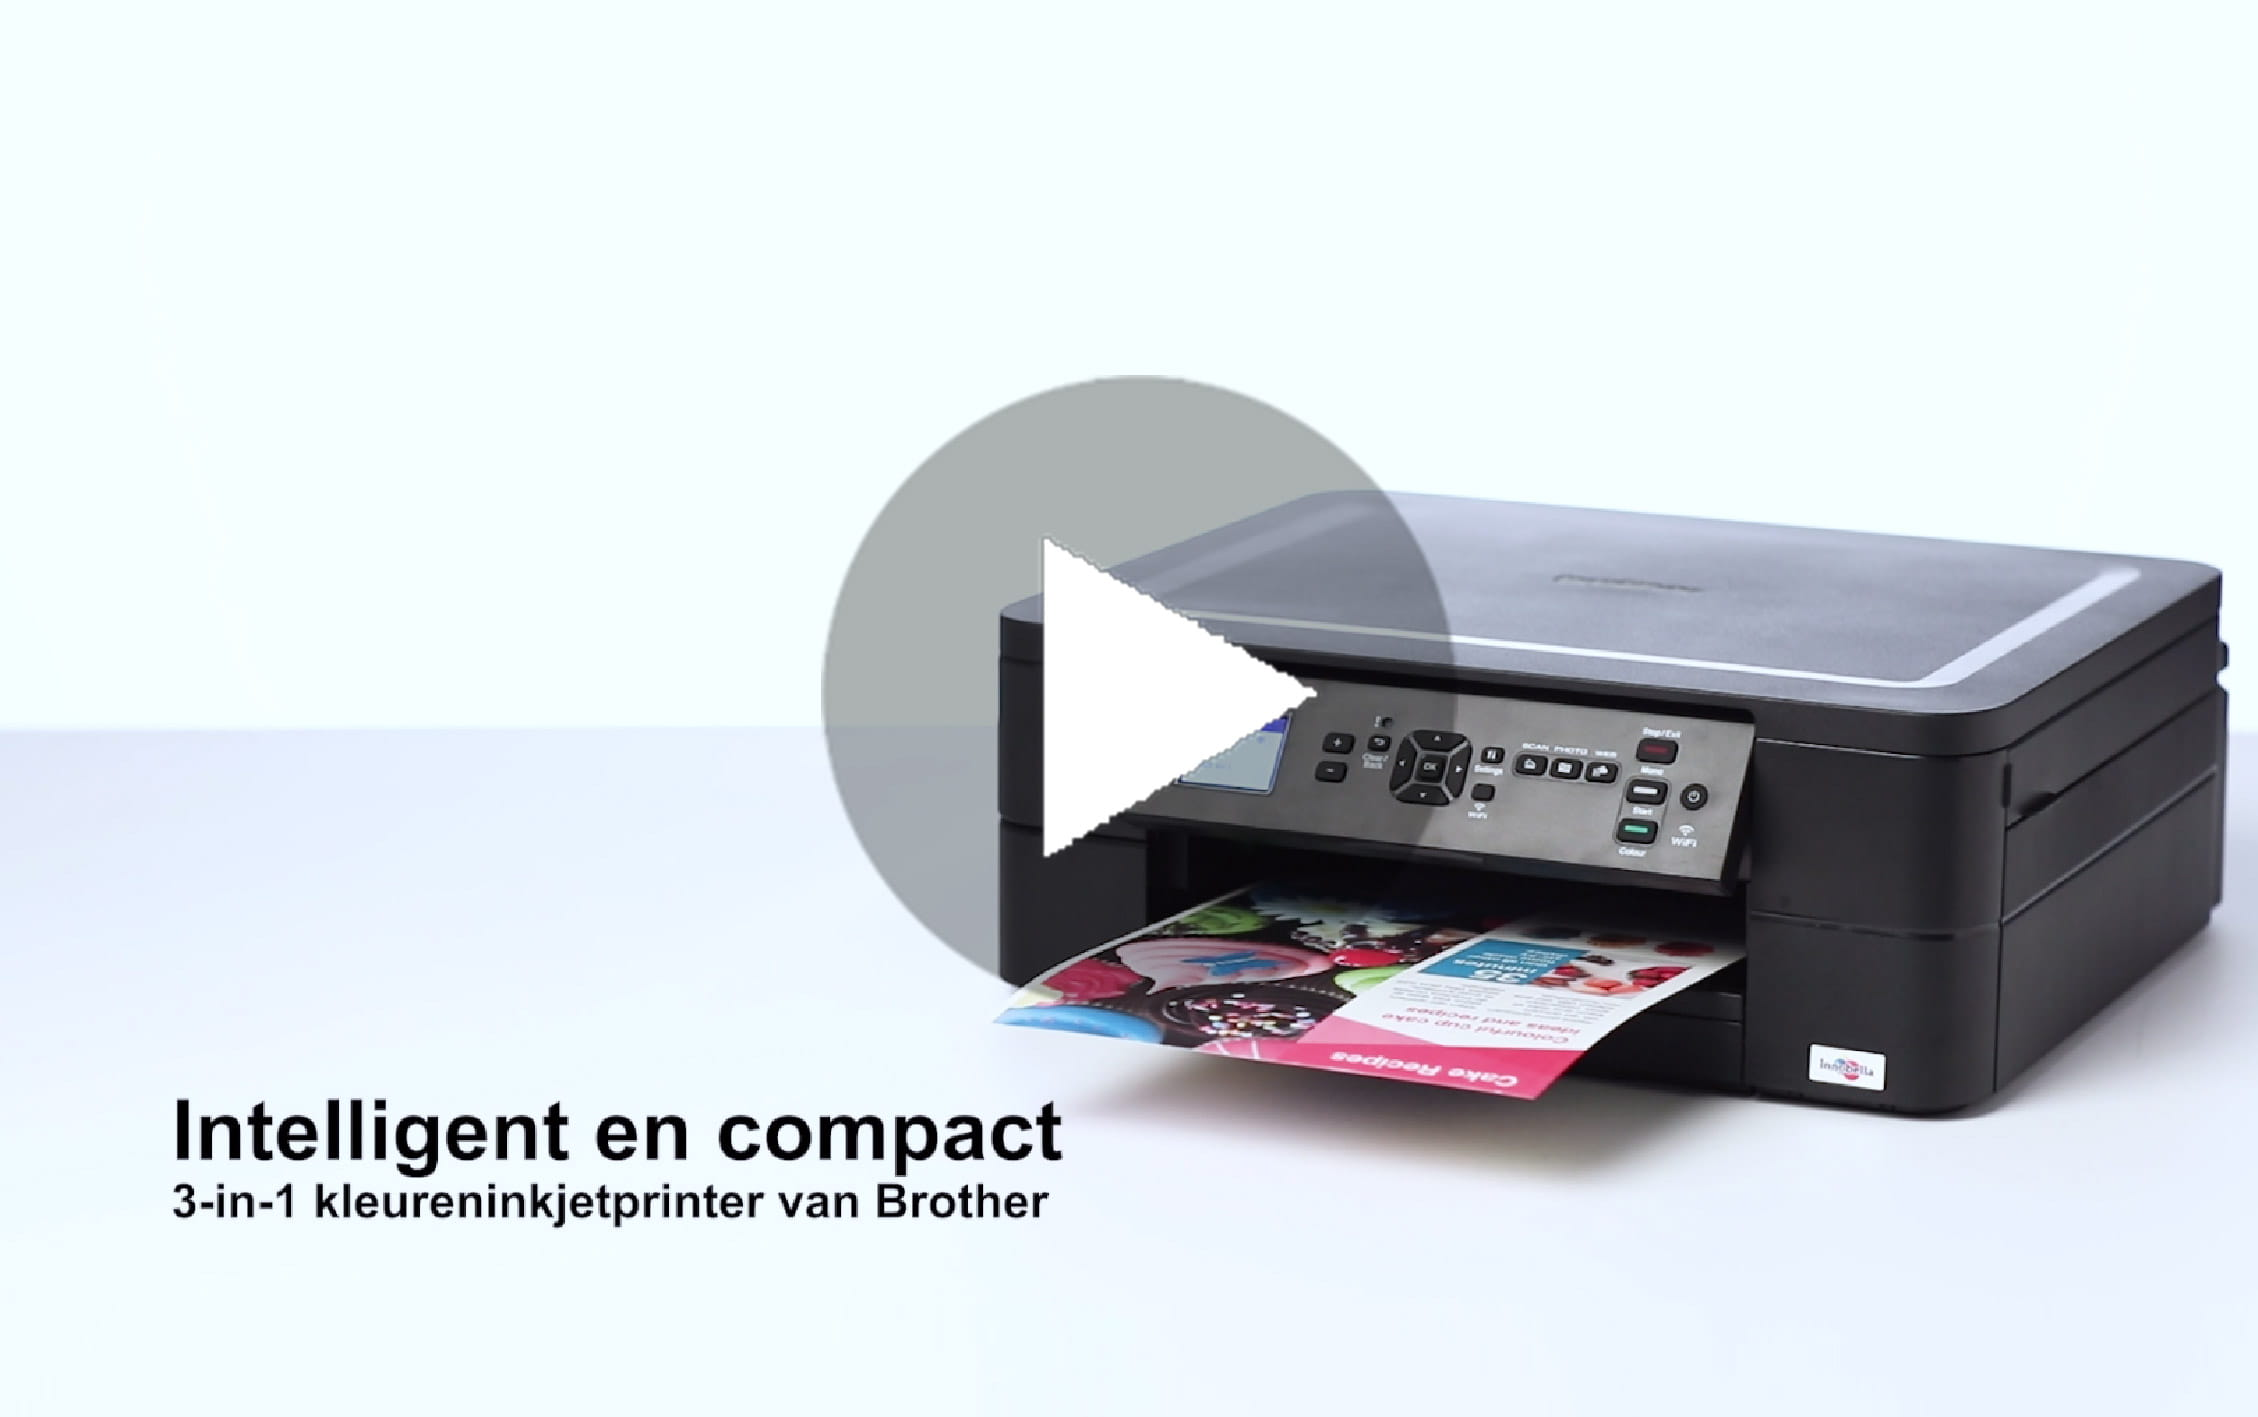 Draadloze kleureninkjetprinter DCP-J572DW 8